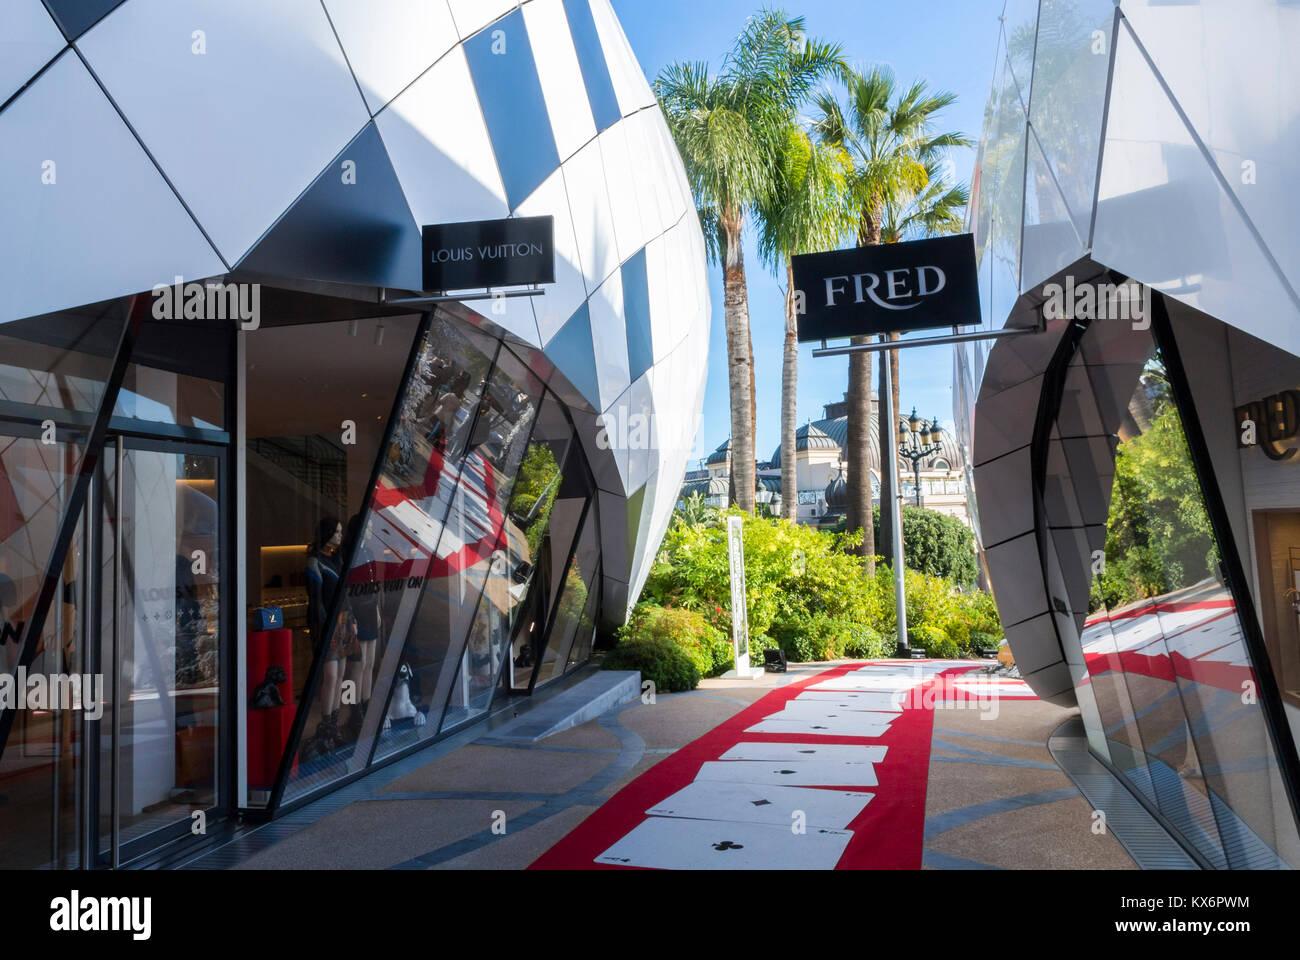 Monaco, Monte Carlo, Les Pavillions, Luxury Shops, Shopping Center, Fred Luxury CLothing Store Sign - Stock Image